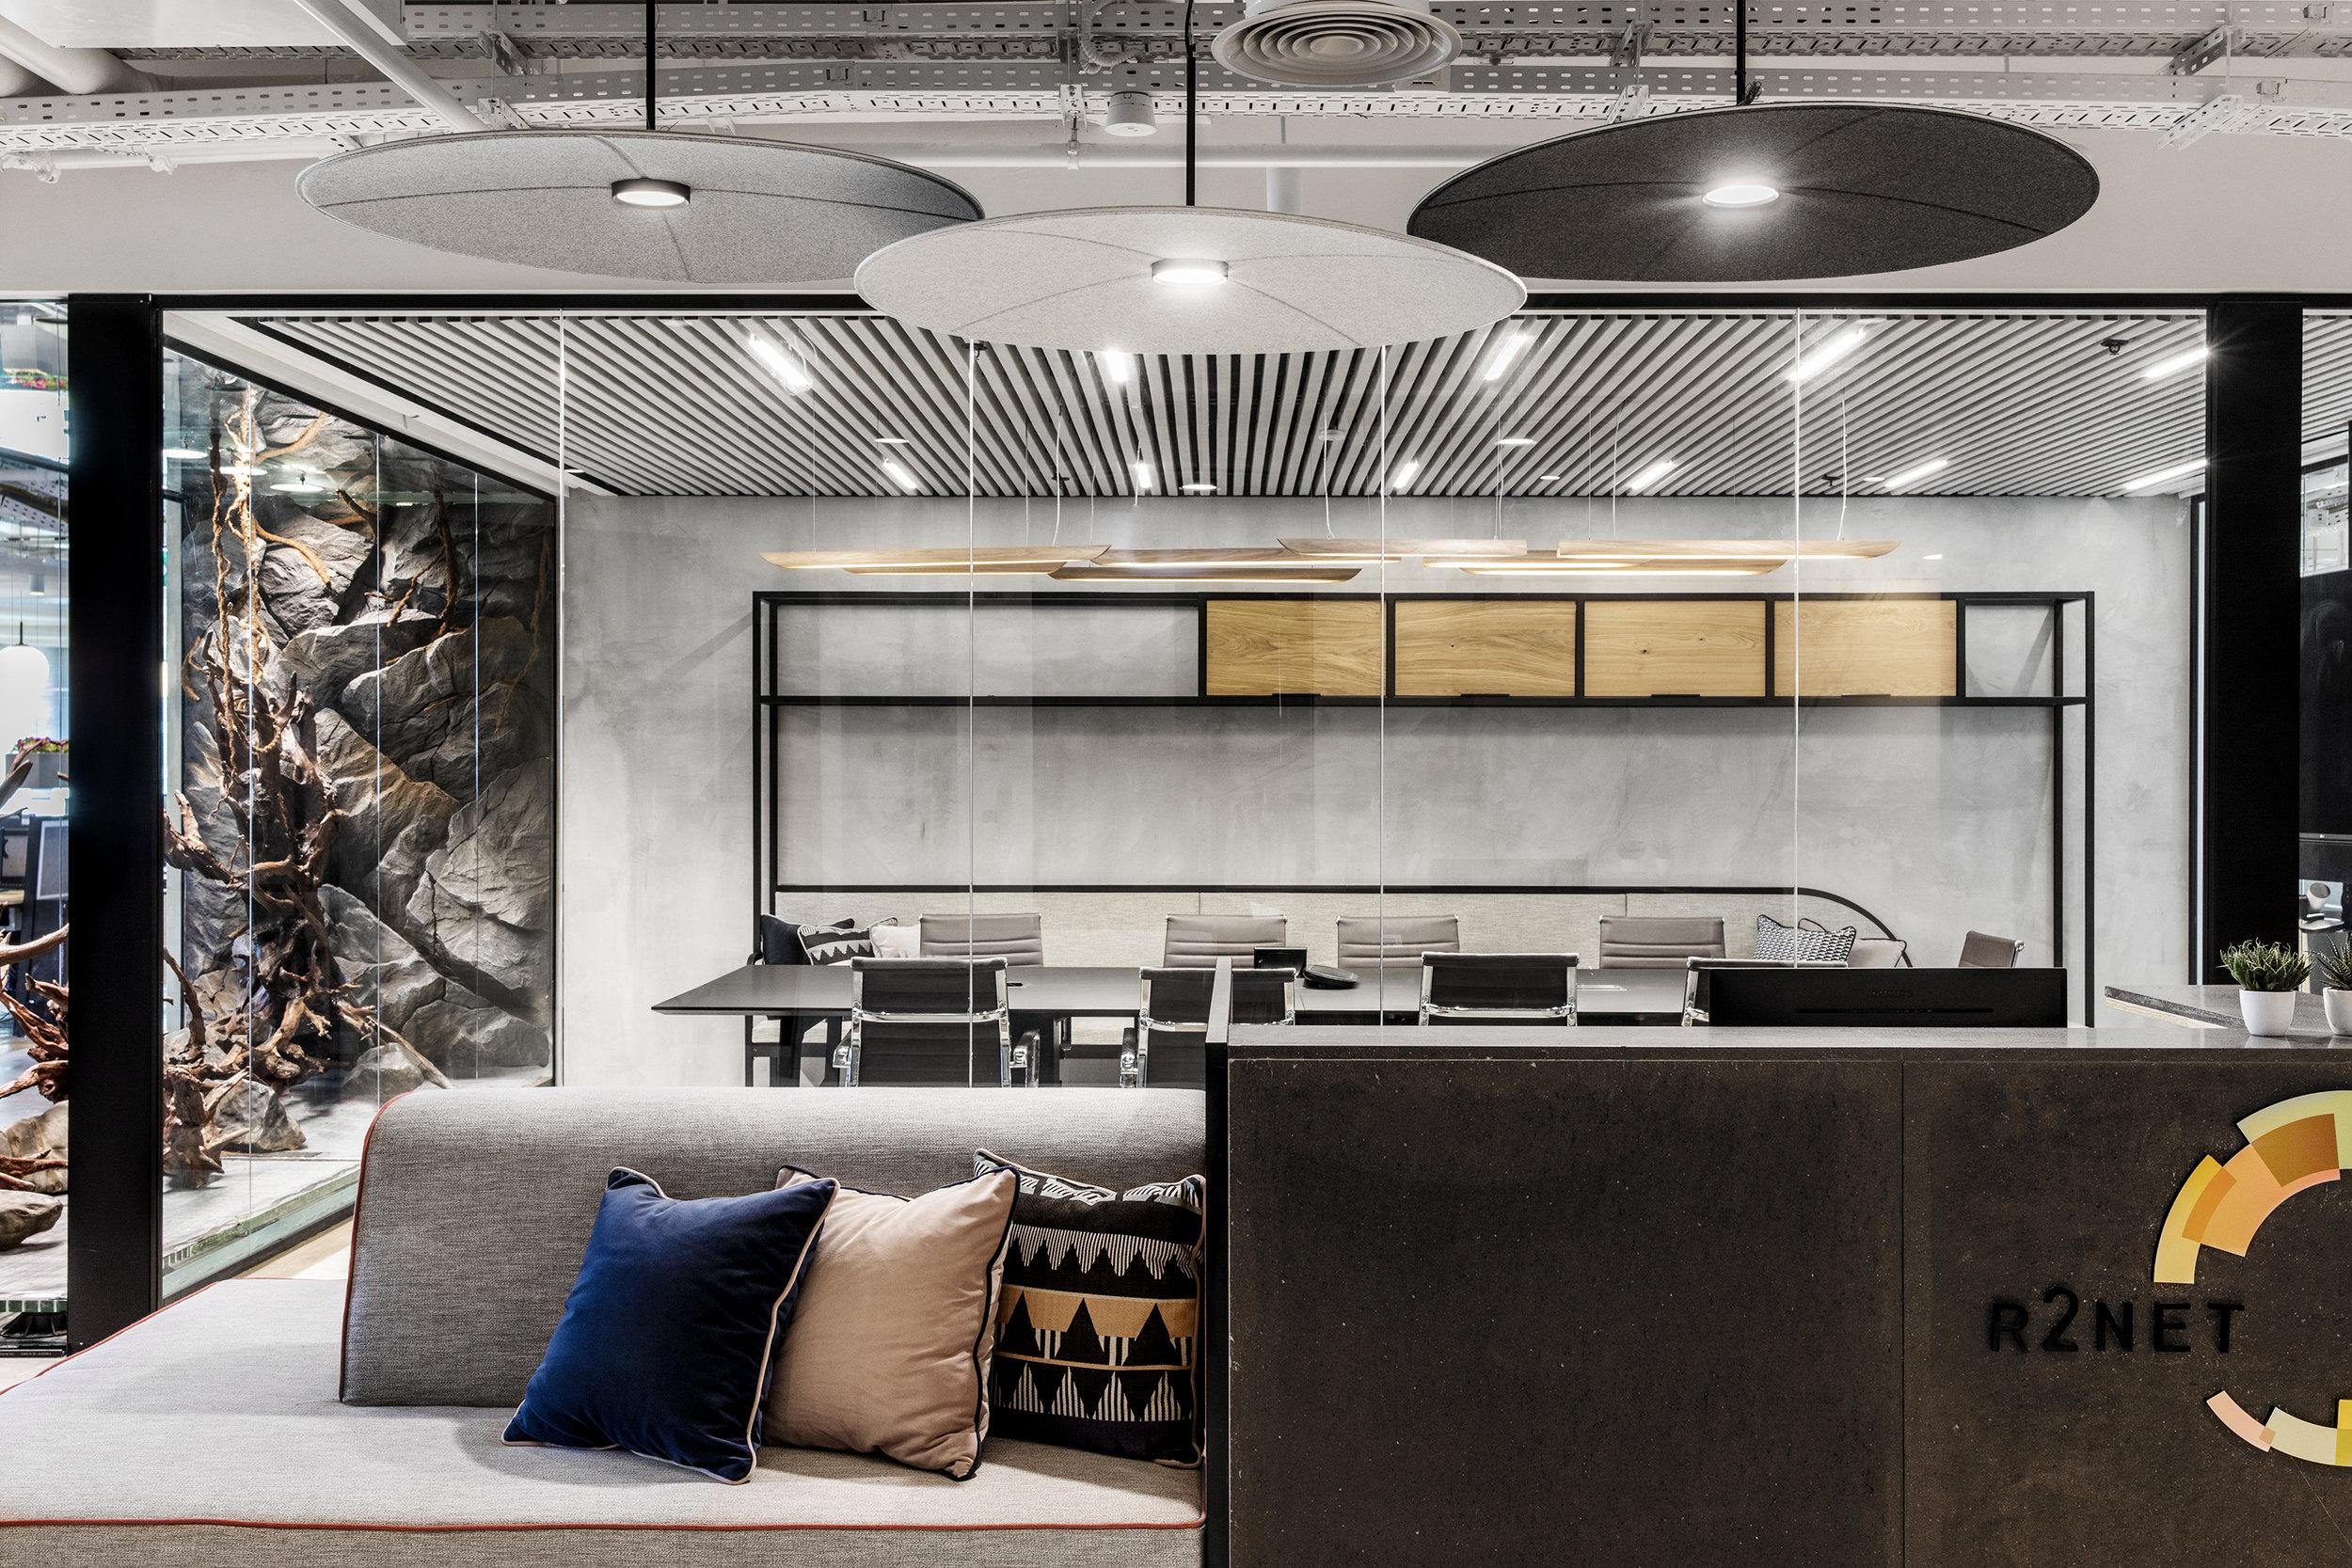 R2NET OFFICES - ROY DAVID ARCHITECTURE  STUDIO - רואי דוד אדריכלות סטודיו אדריכלים - אר2נט (47).jpg